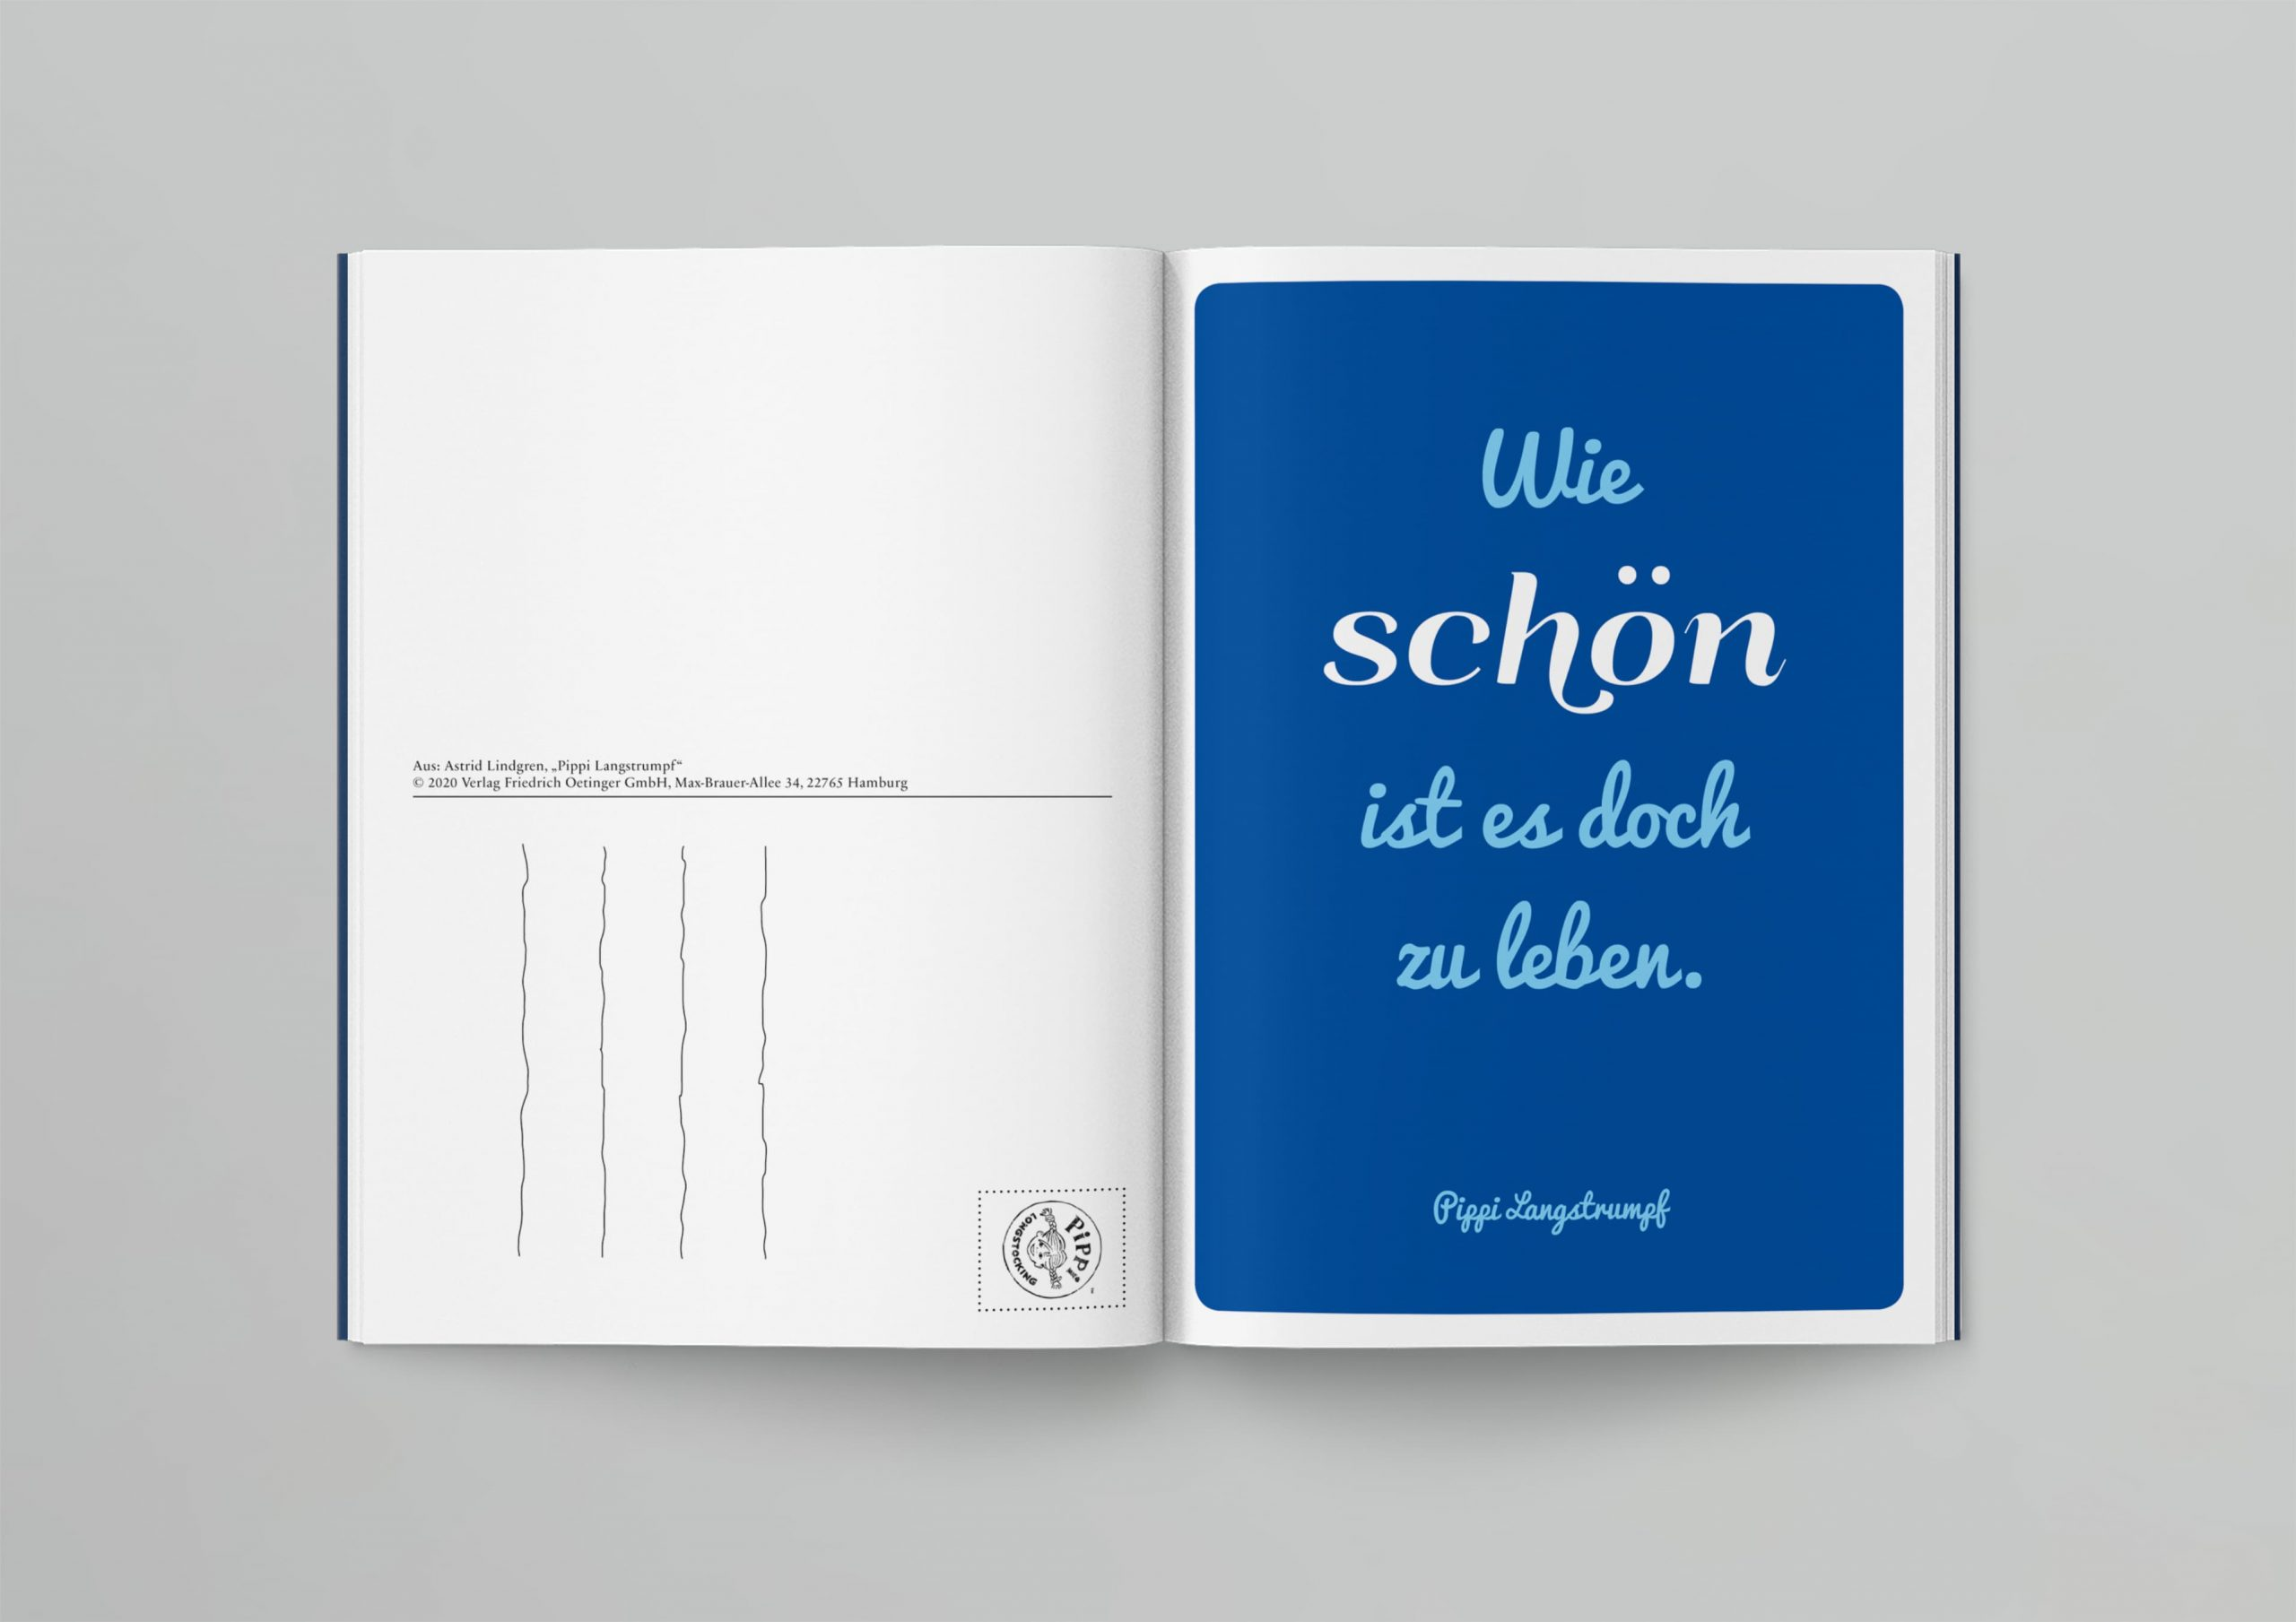 Oetinger-Pippi-Langstrumpf-Postkarten-IN01